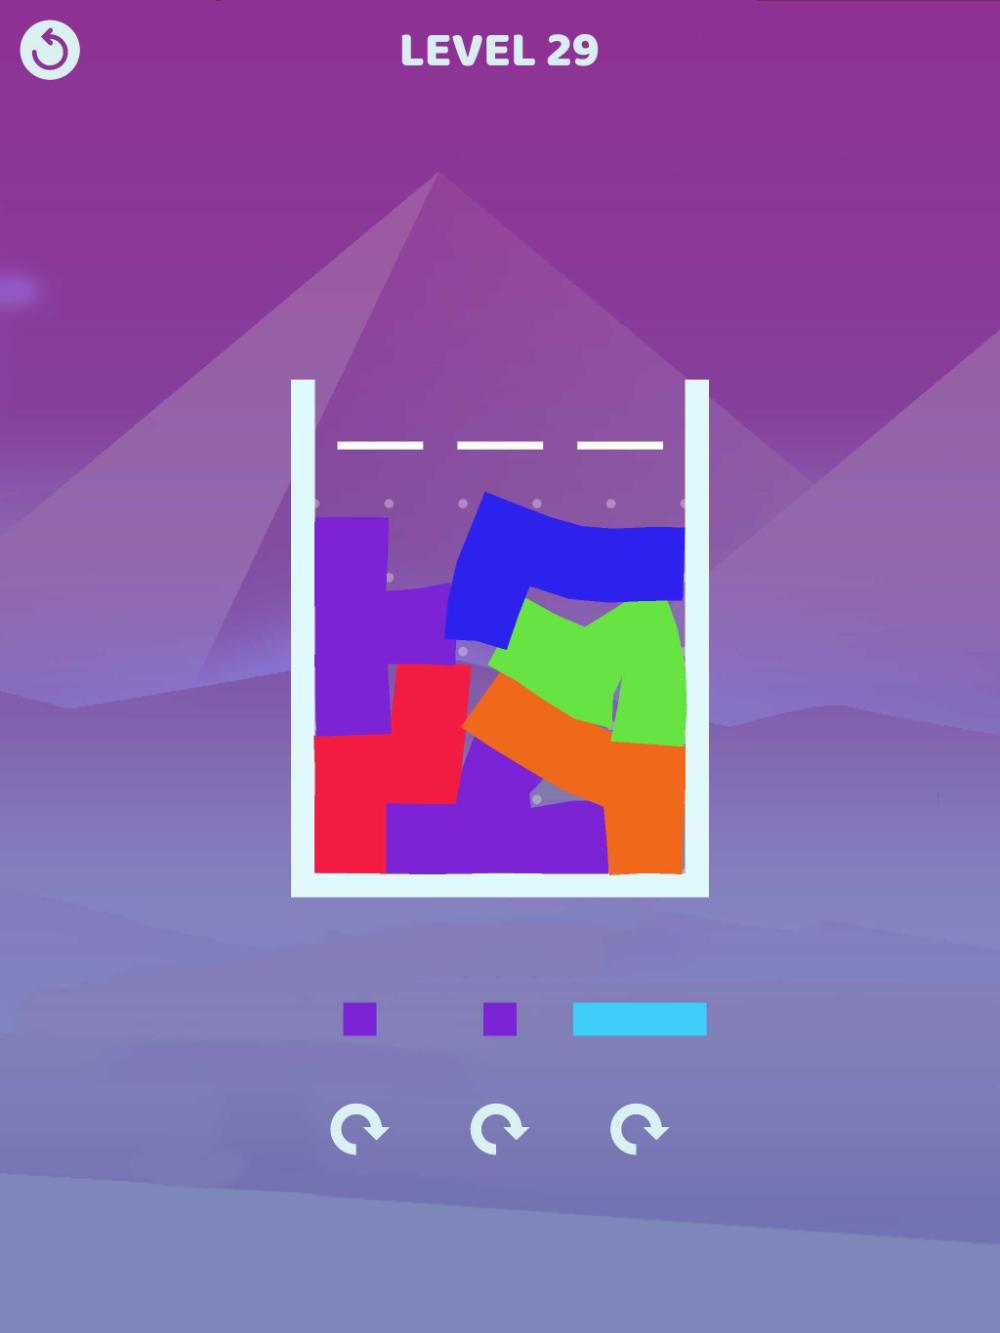 「Jelly Fill(ジェリーフィル)」って良いアプリなの?【ももこのアプリレビュー】